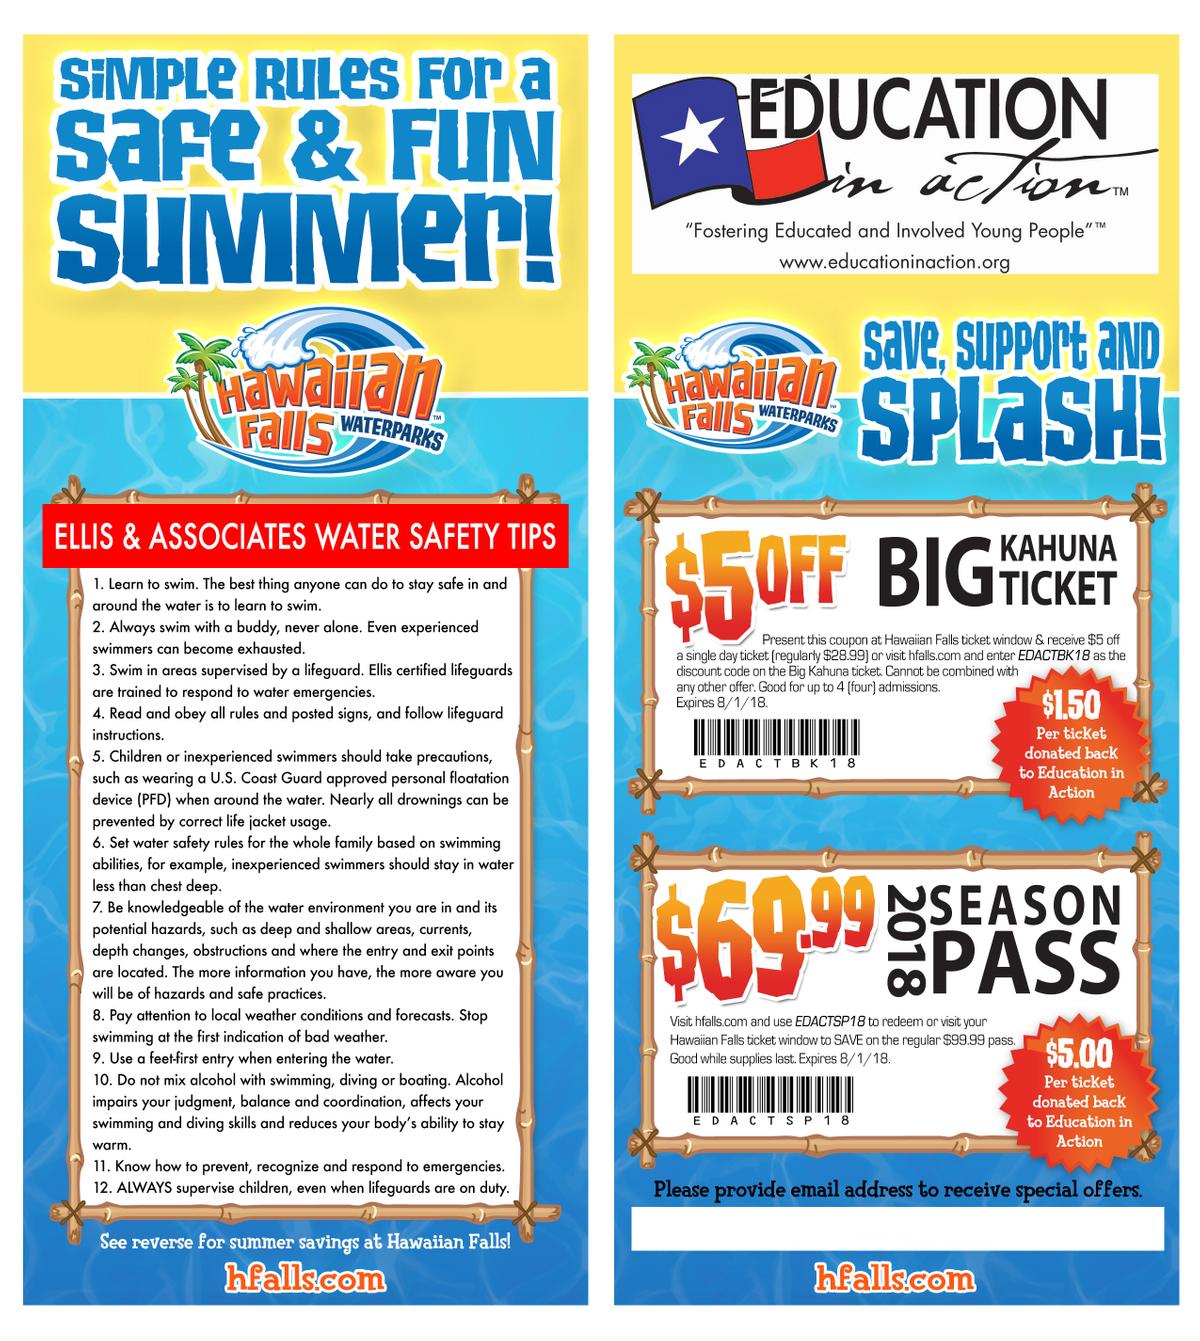 18DIGISafetyCert_EducationInAction.jpg